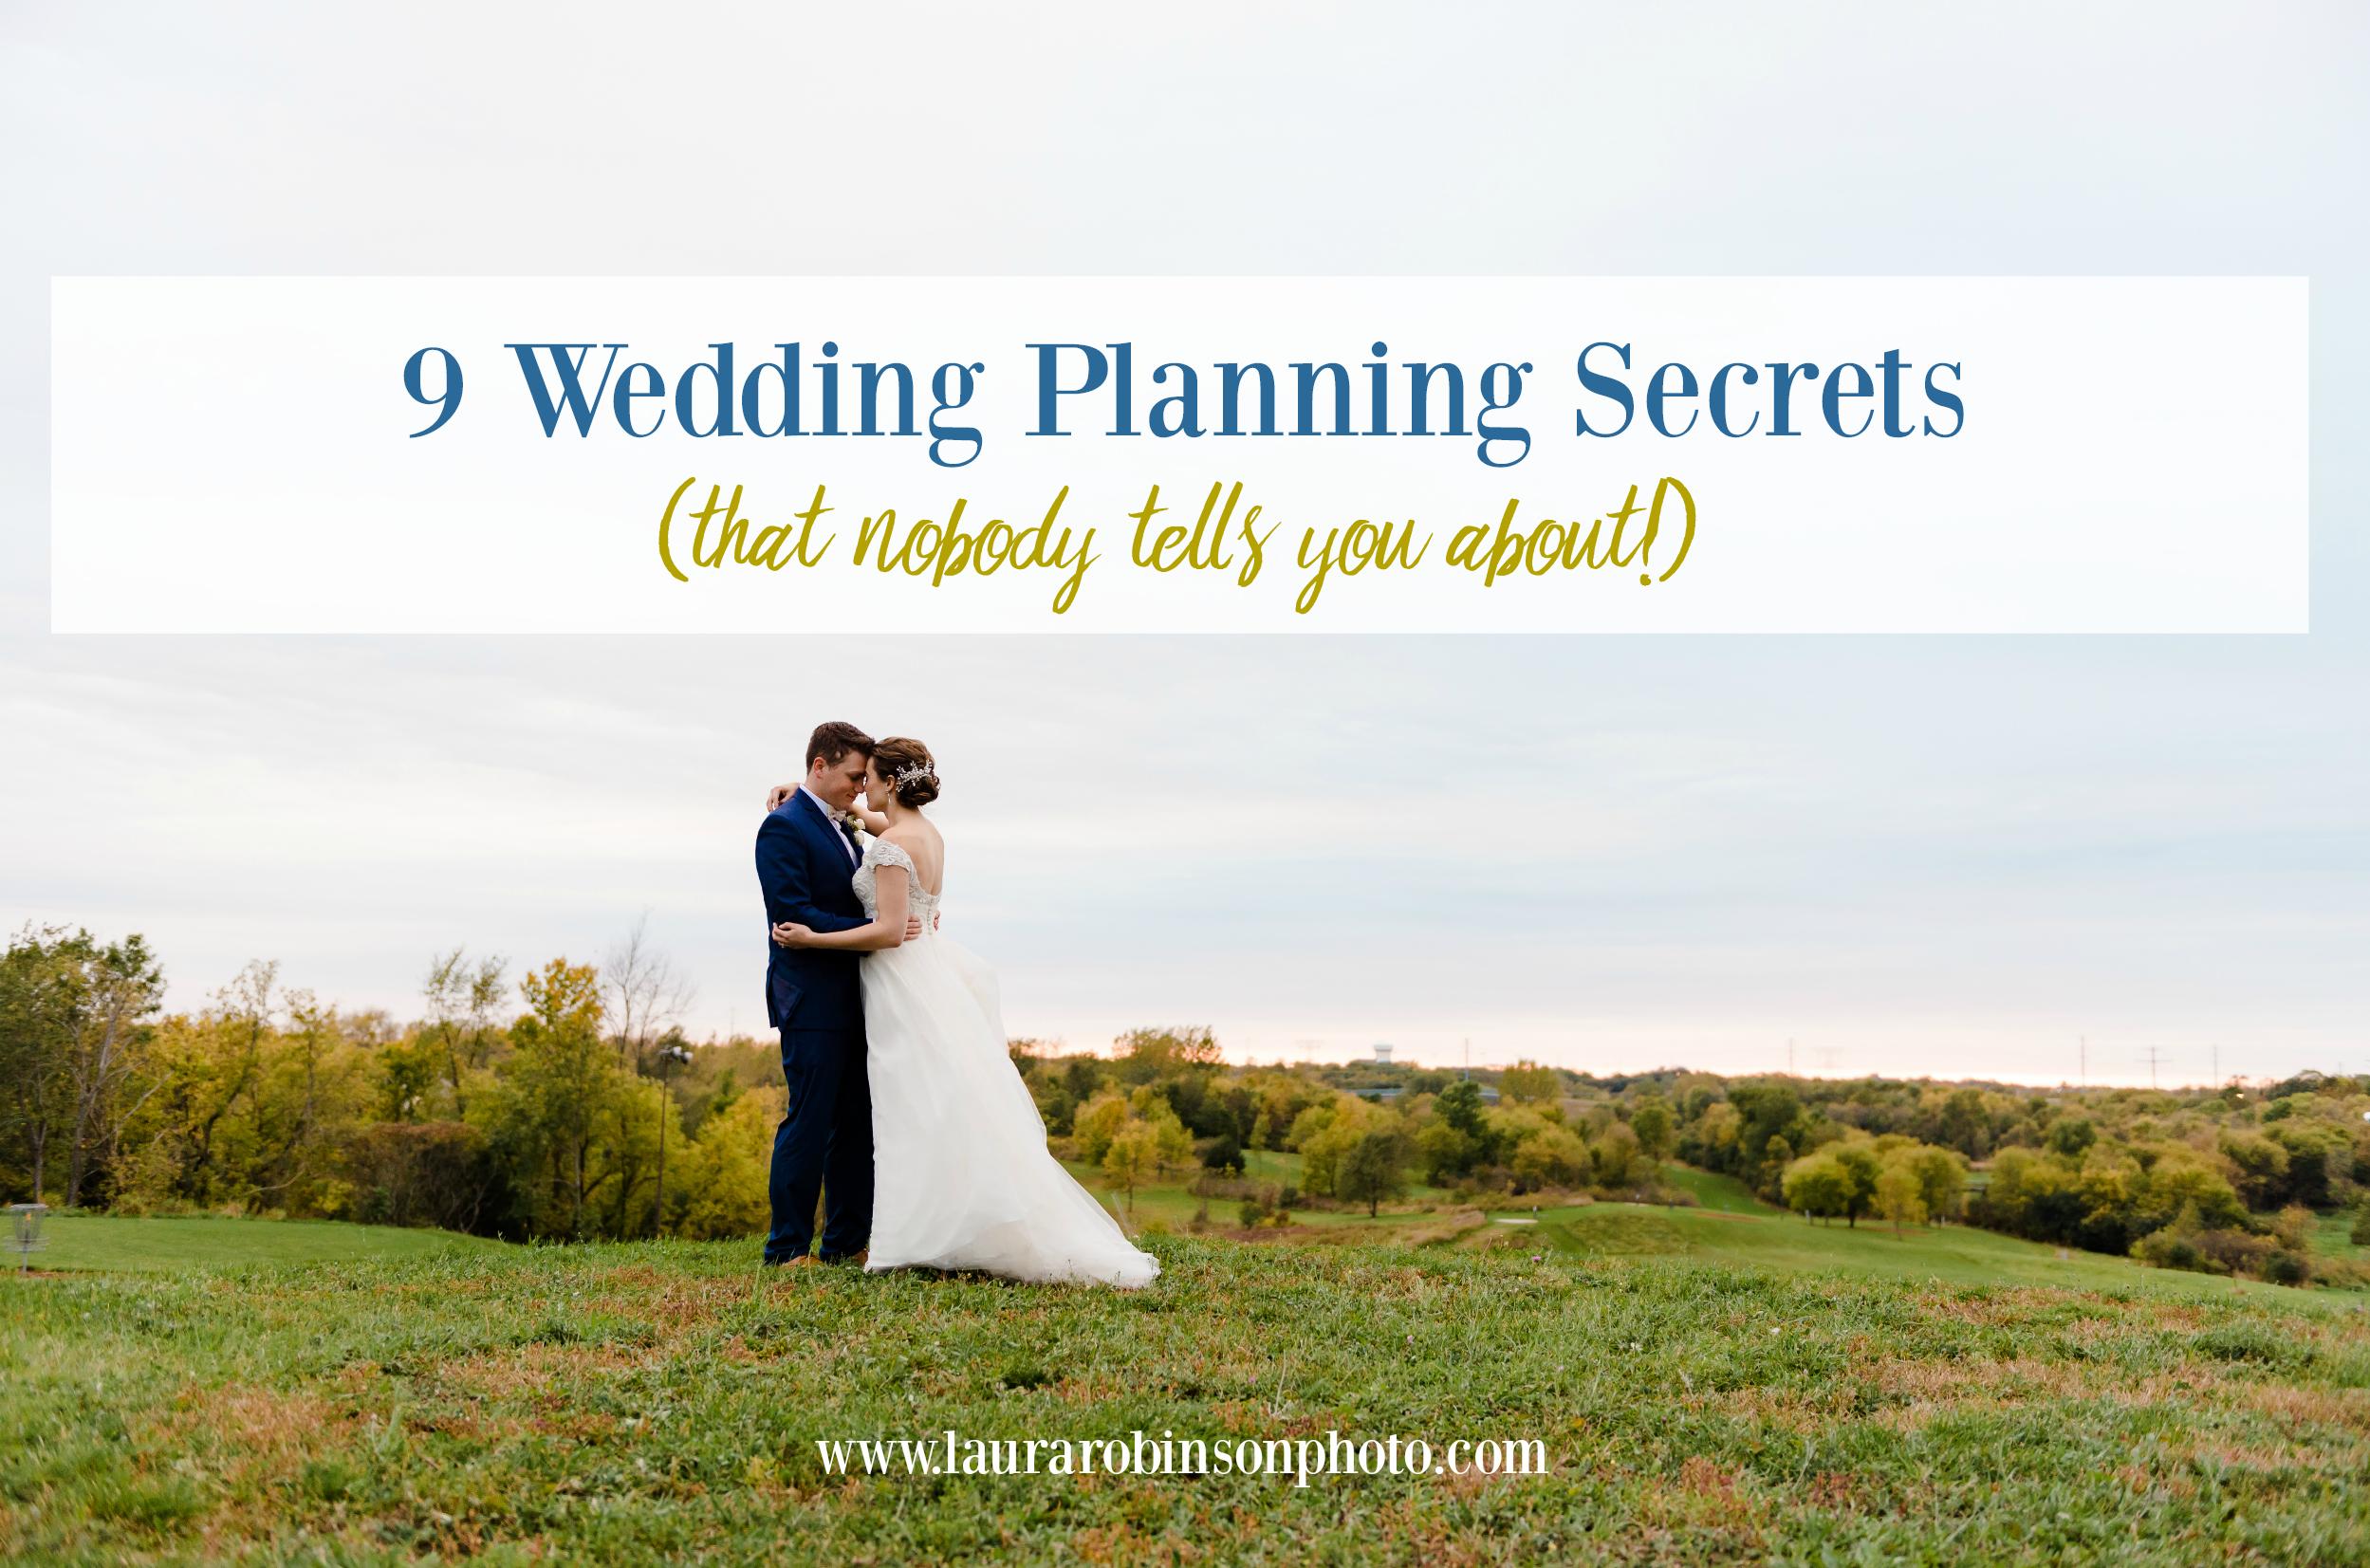 wedding planning secrets